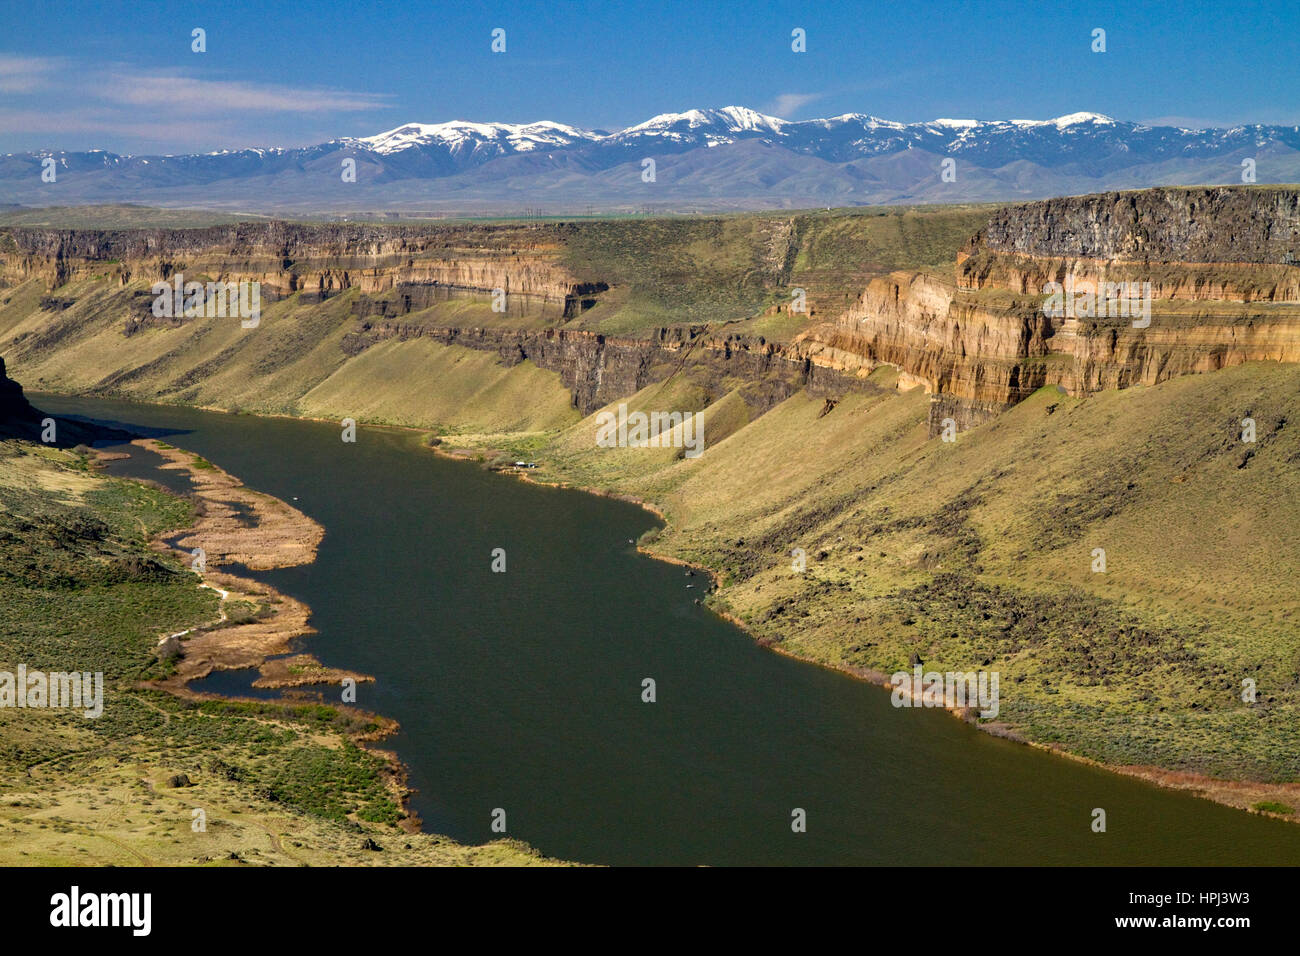 Snake River Canyon am Swan fällt-Damm, Owyhee County, Idaho, USA. Stockfoto